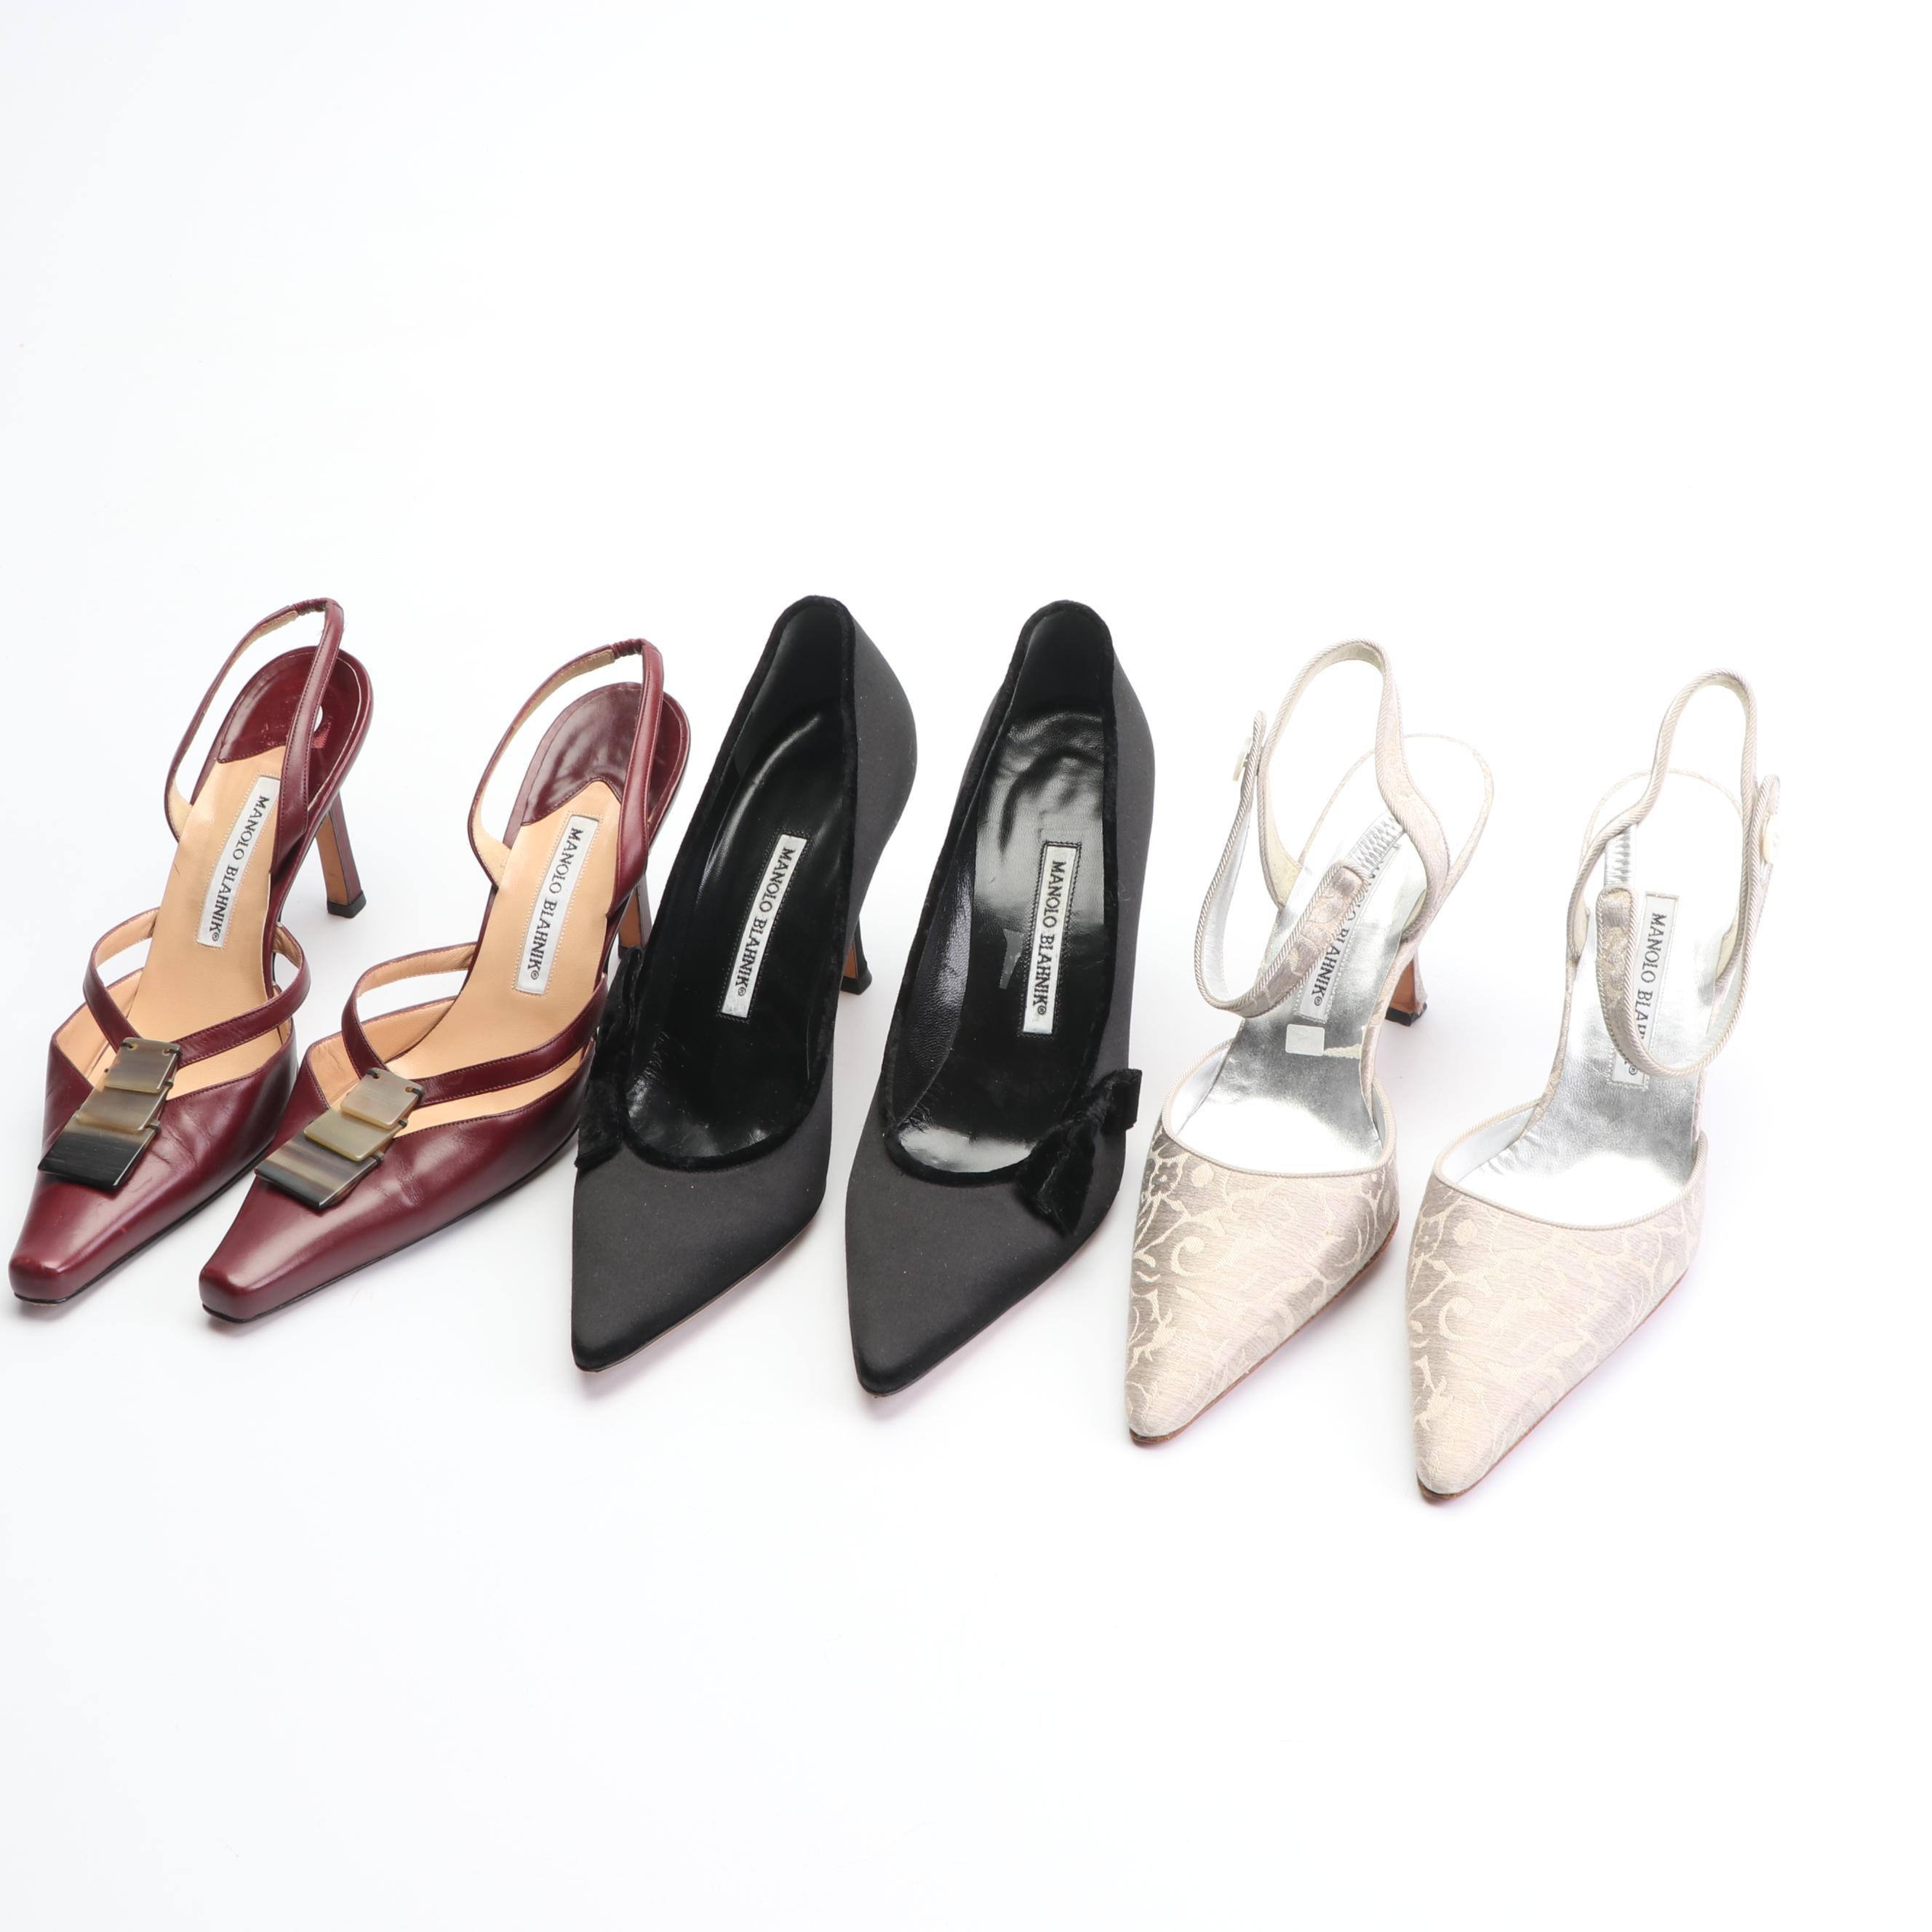 Manolo Blahnik Fabric and Leather High-Heeled Pumps and Slingbacks